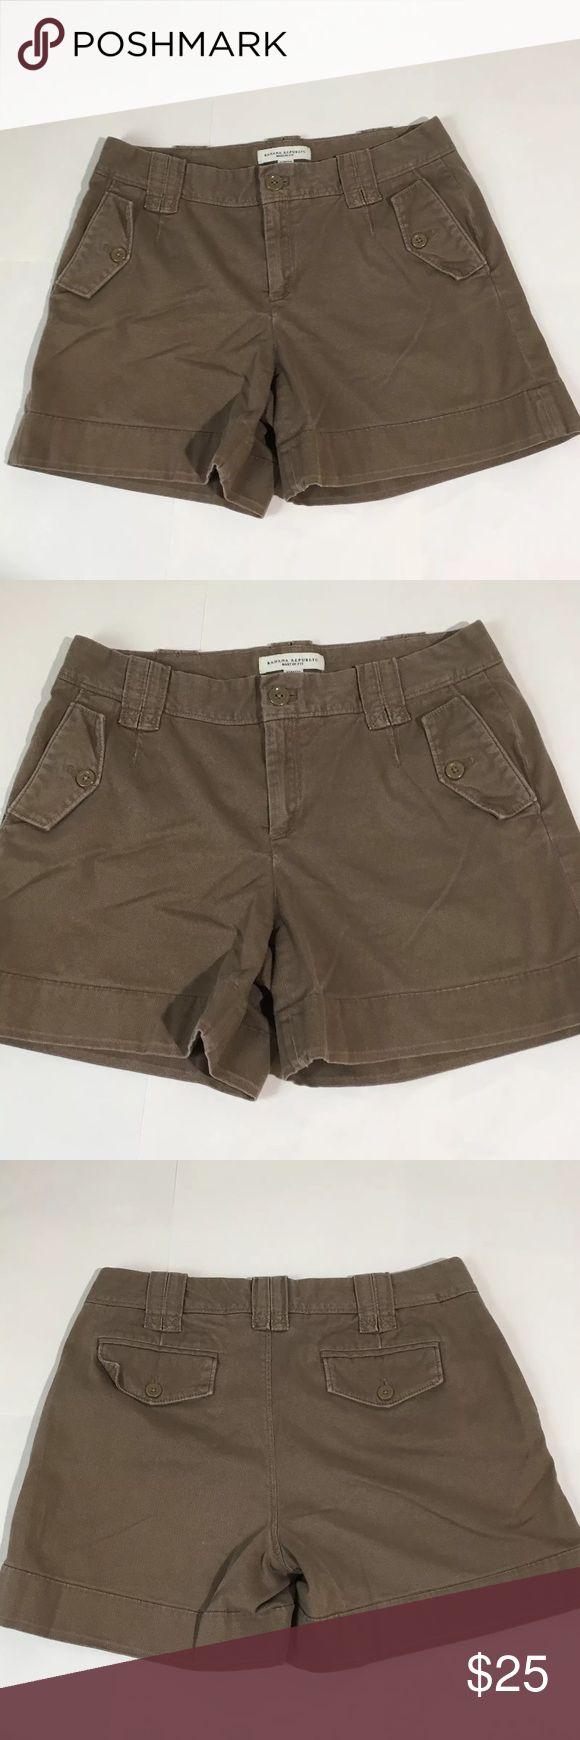 "Banana Republic Martin Fit Brown Shorts Sz 6 Women's Banana Republic Martin Fit brown shorts size 6. Measurements 14.5"" waist laying flat, 13"" waist to hem, 5"" inseam. Excellent condition no flaws Banana Republic Shorts"